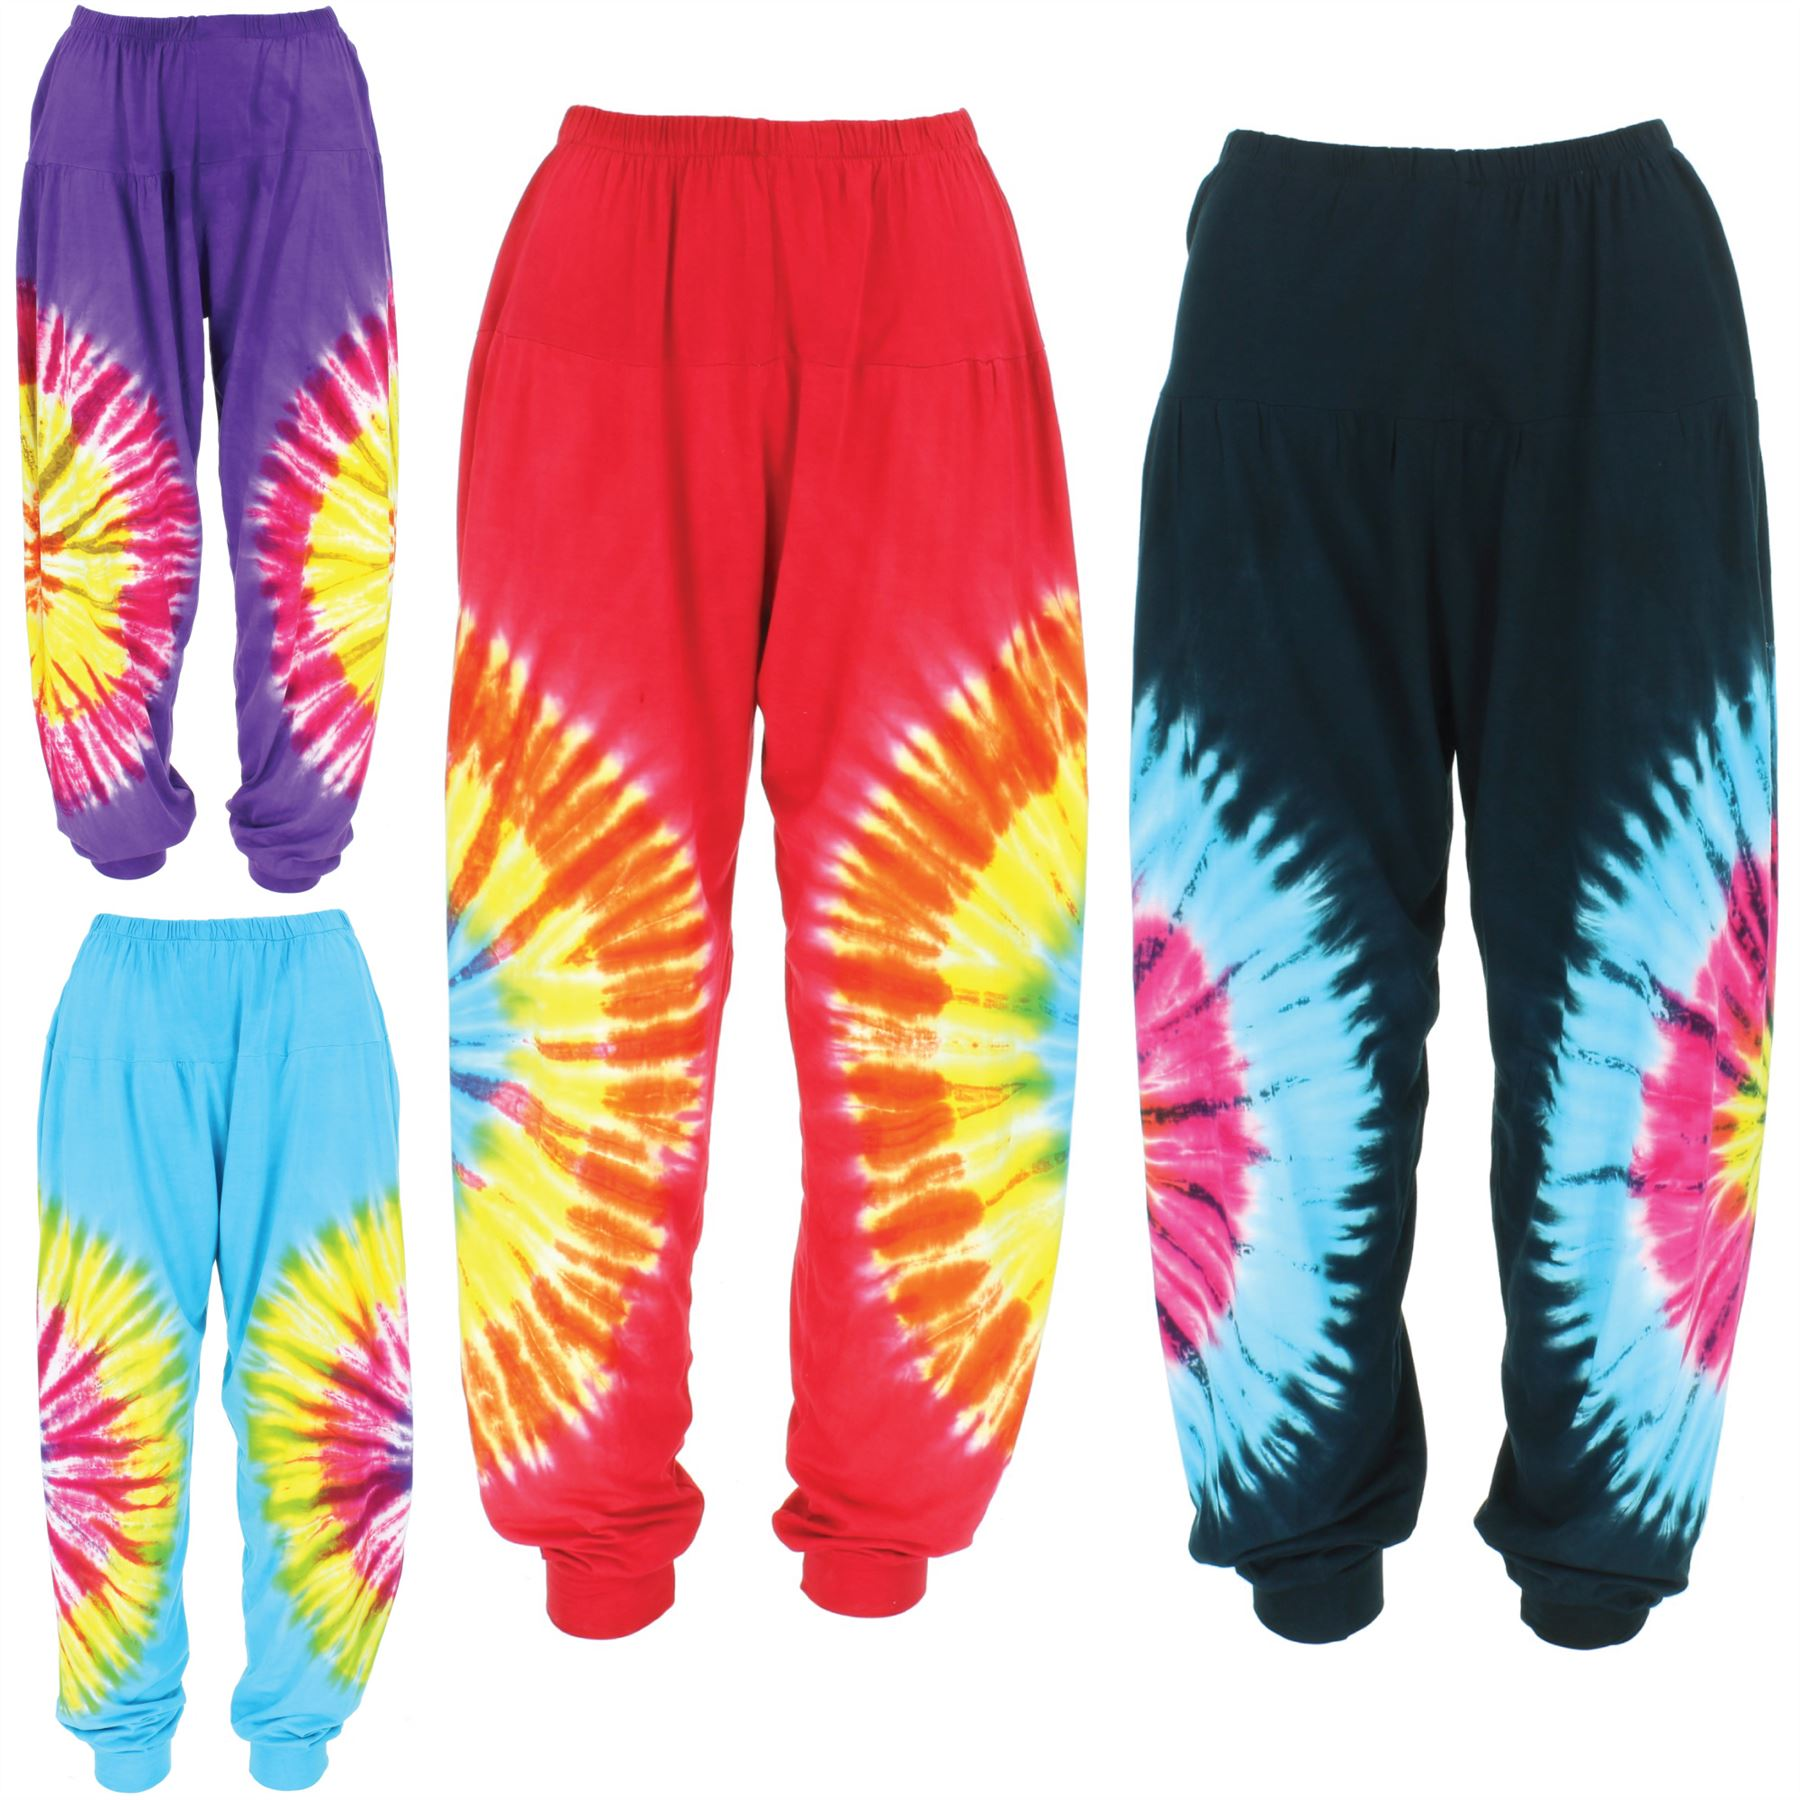 Pantalon Combinaison 2 en 1 COLINE Bouffant Sarouel Aladin  Harem Boho Pants